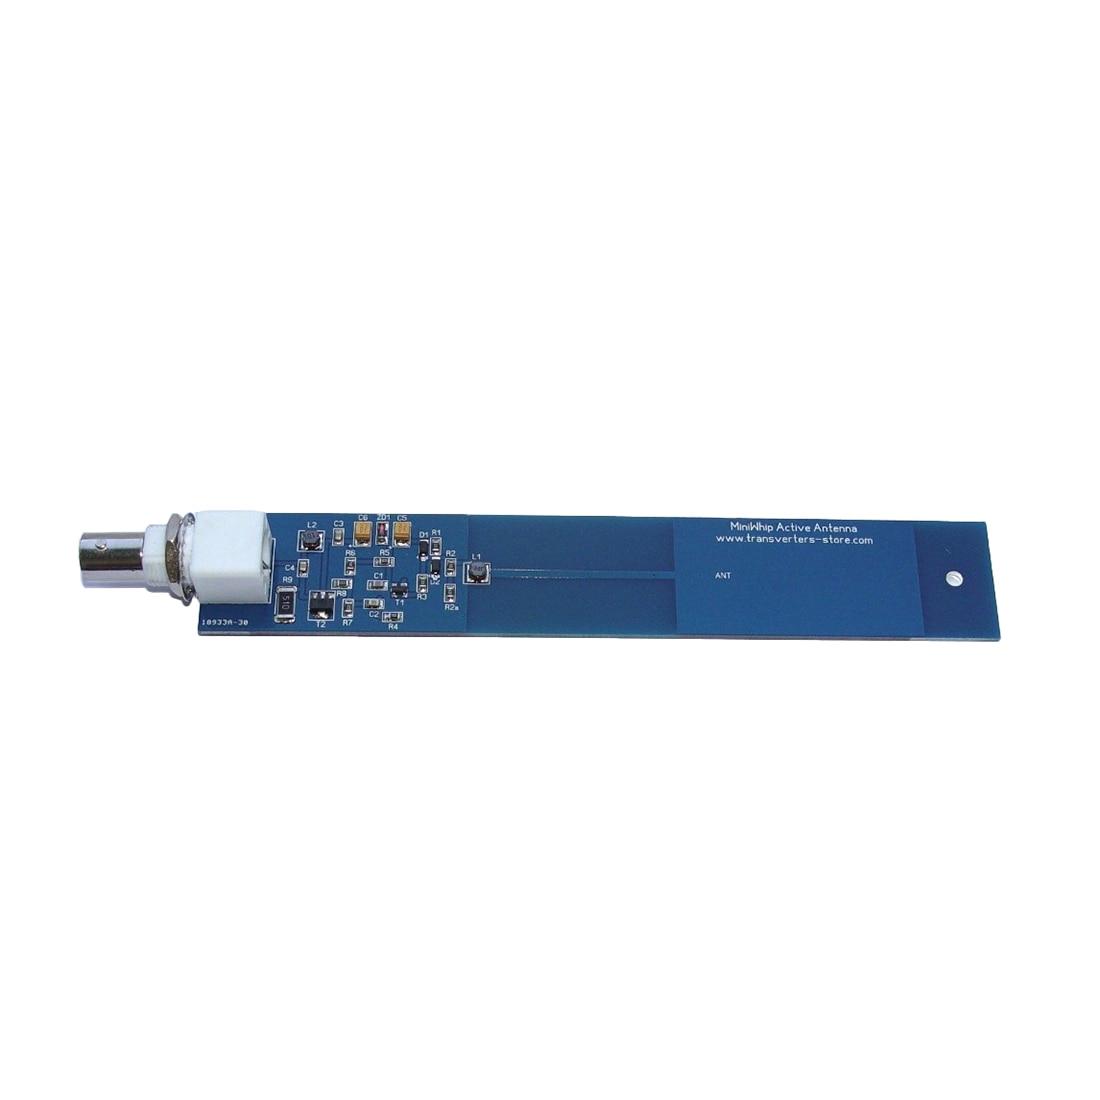 Miniwhip Active Antenna HF LF Vlf Mini Whip Shortwave Sdr RX Portable Receiving